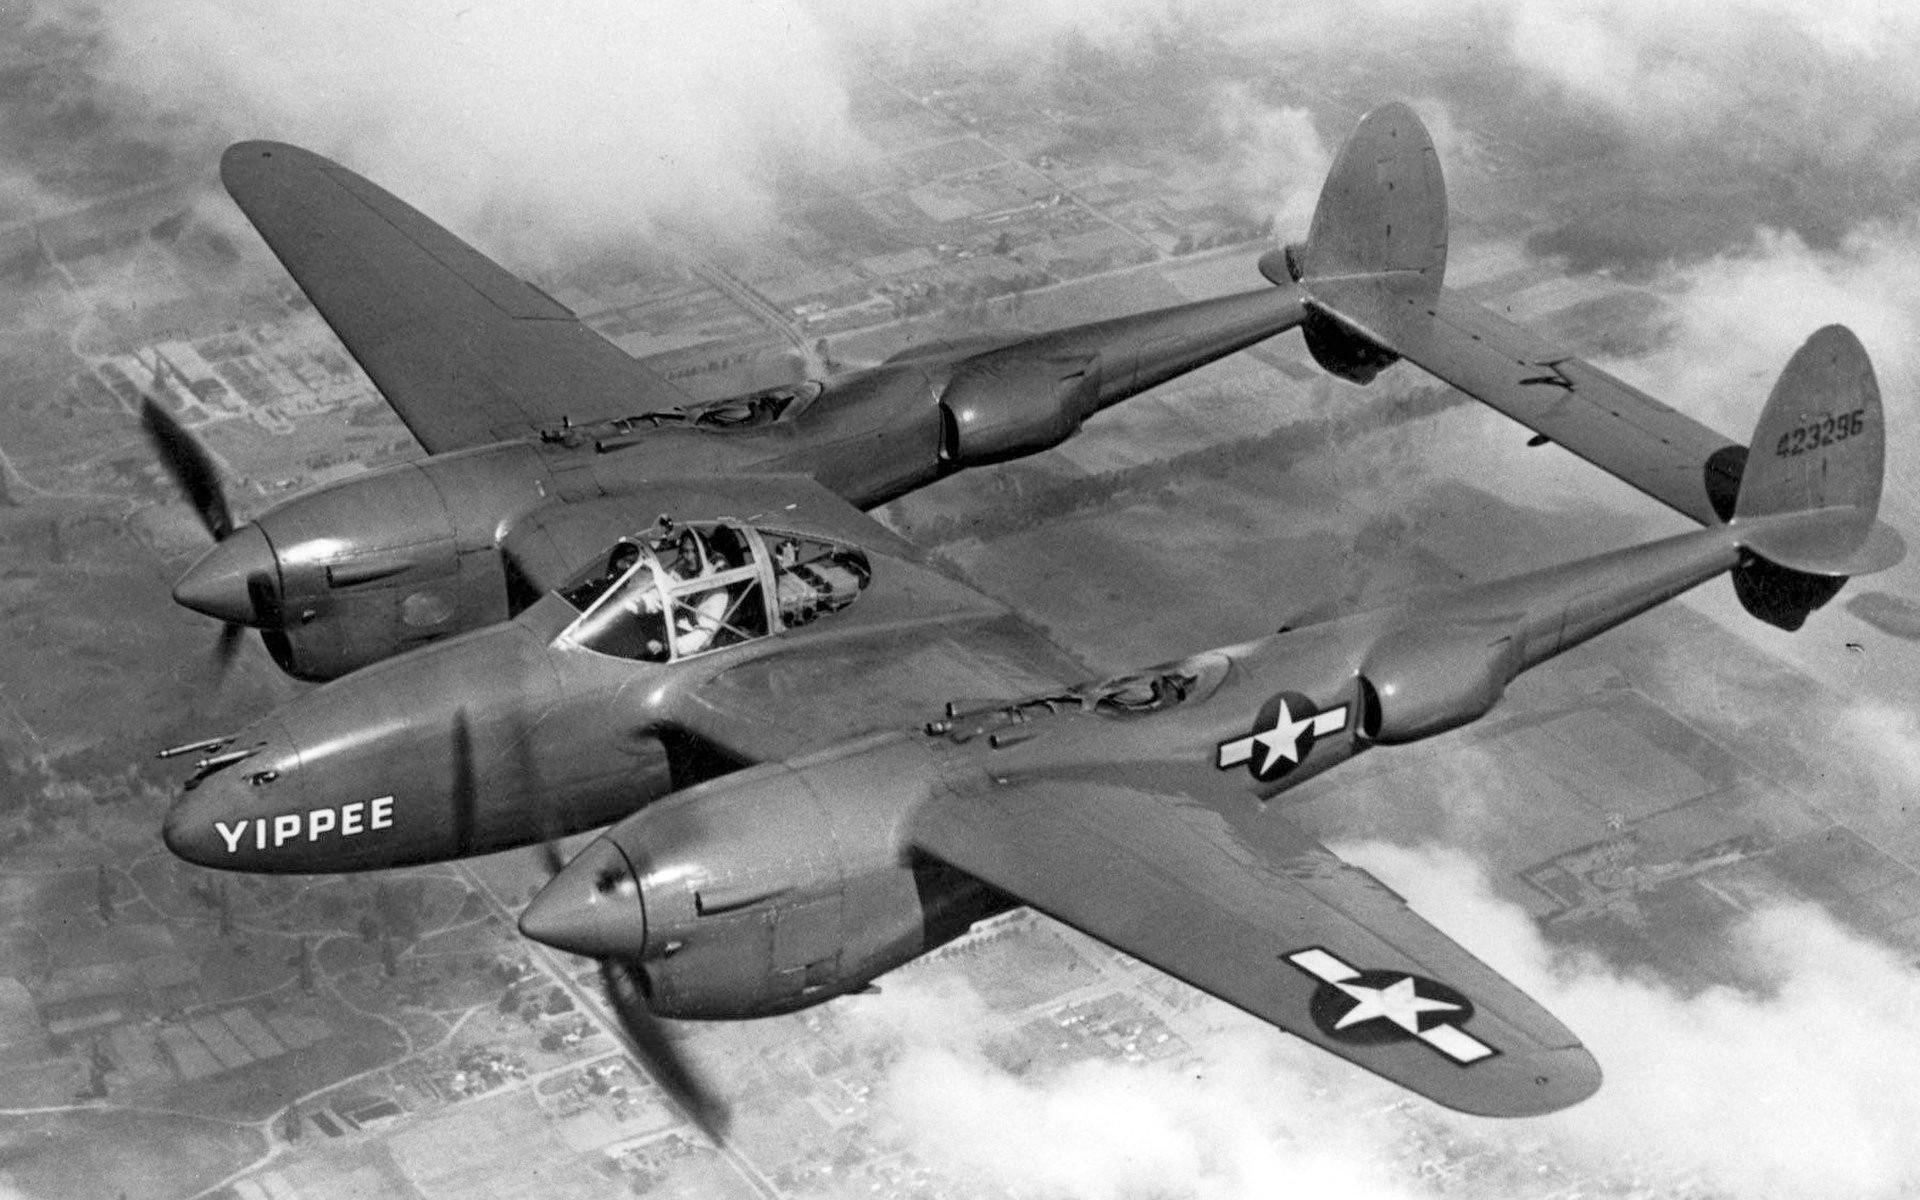 AIRCRAFT P 38 Lightning